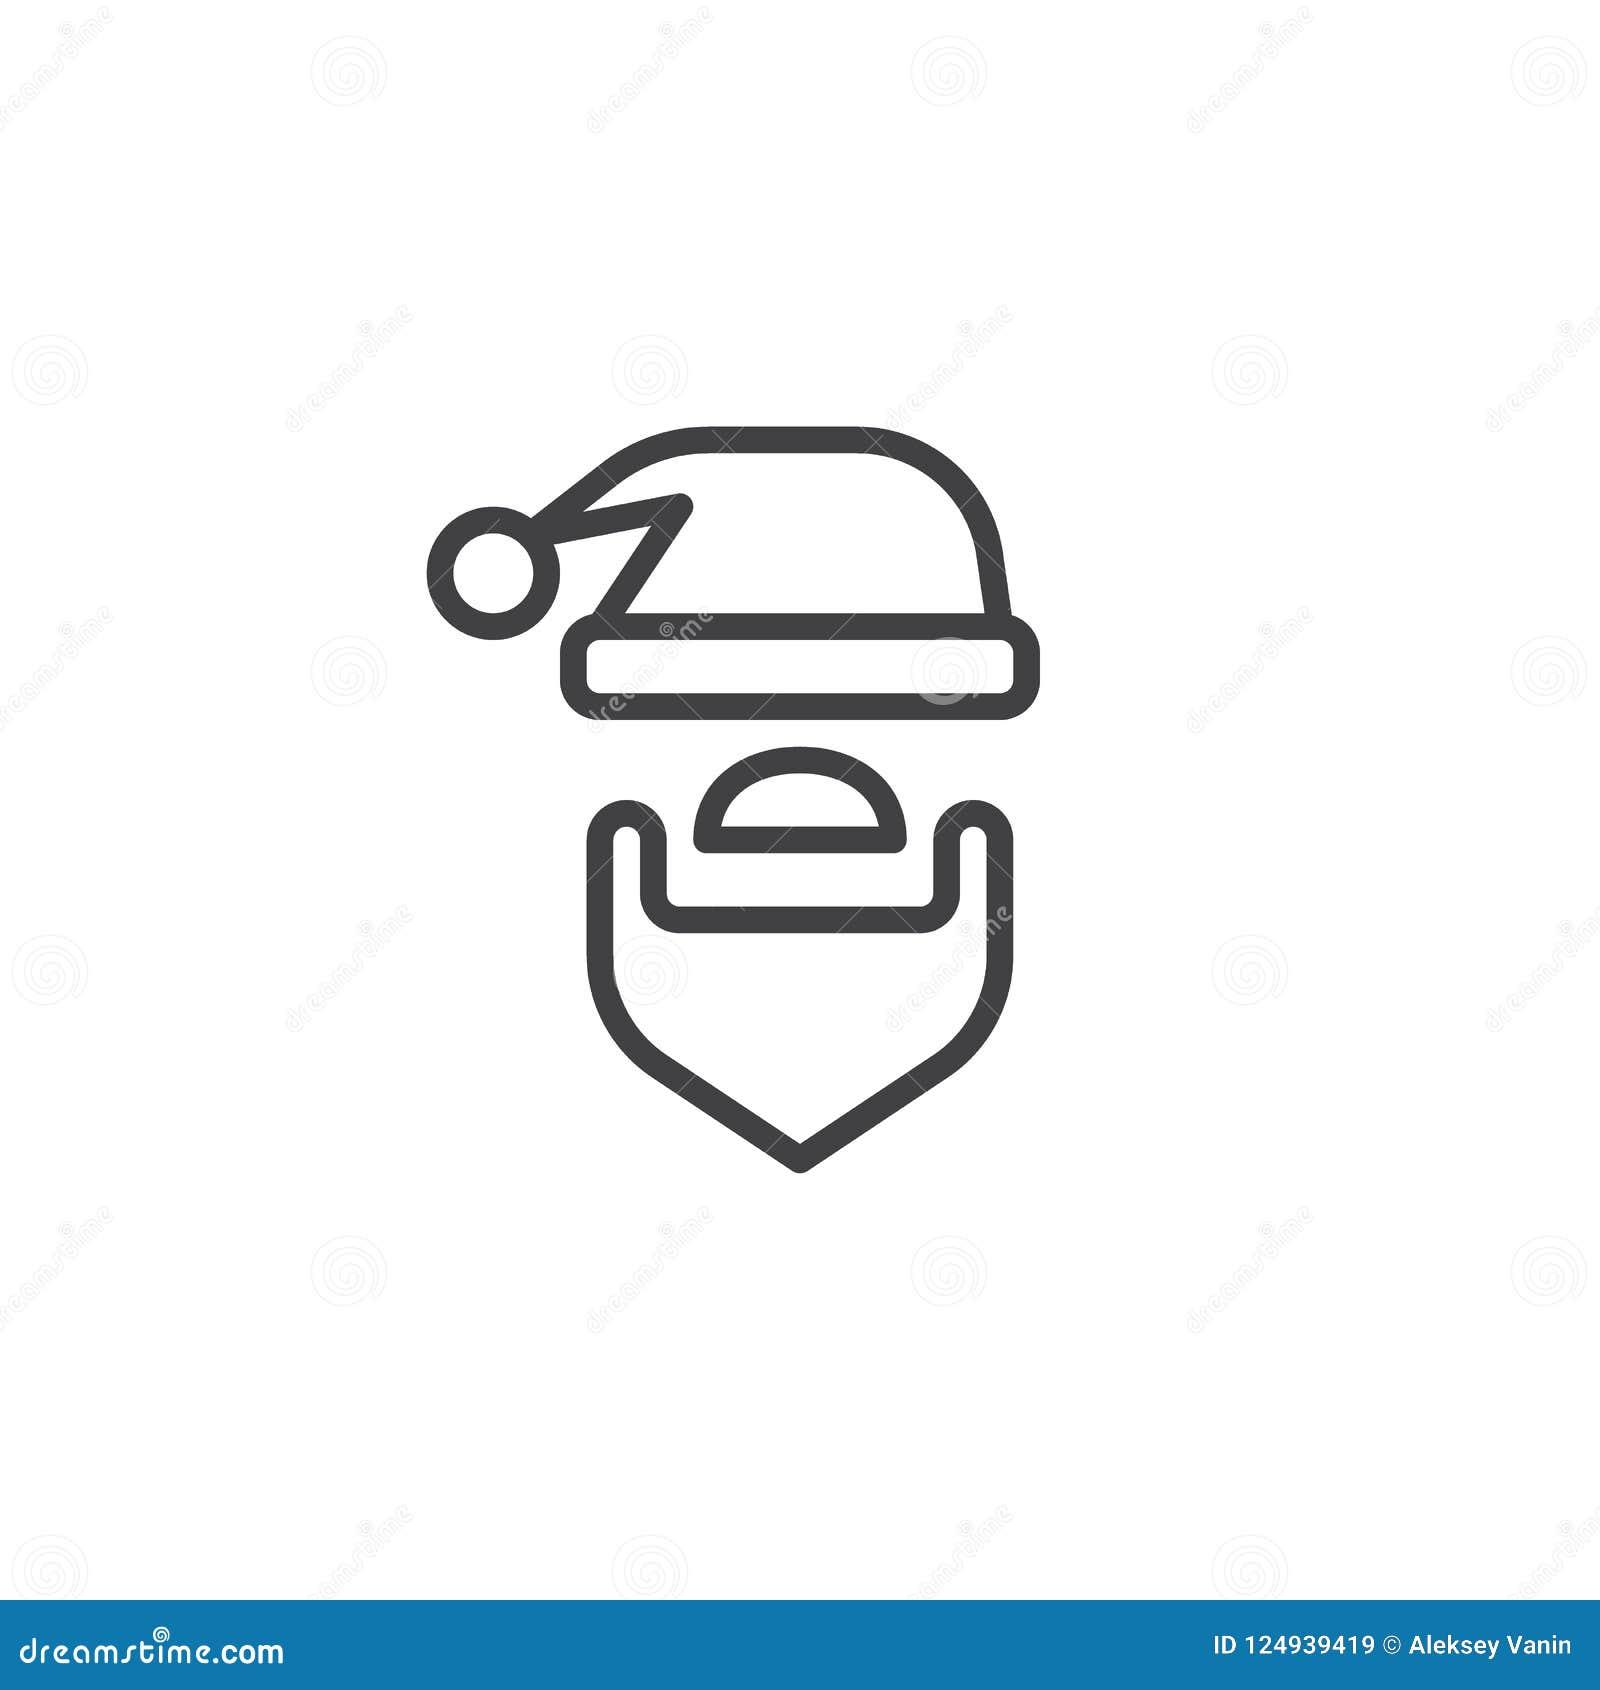 Santa kapelusz i broda konturu ikona